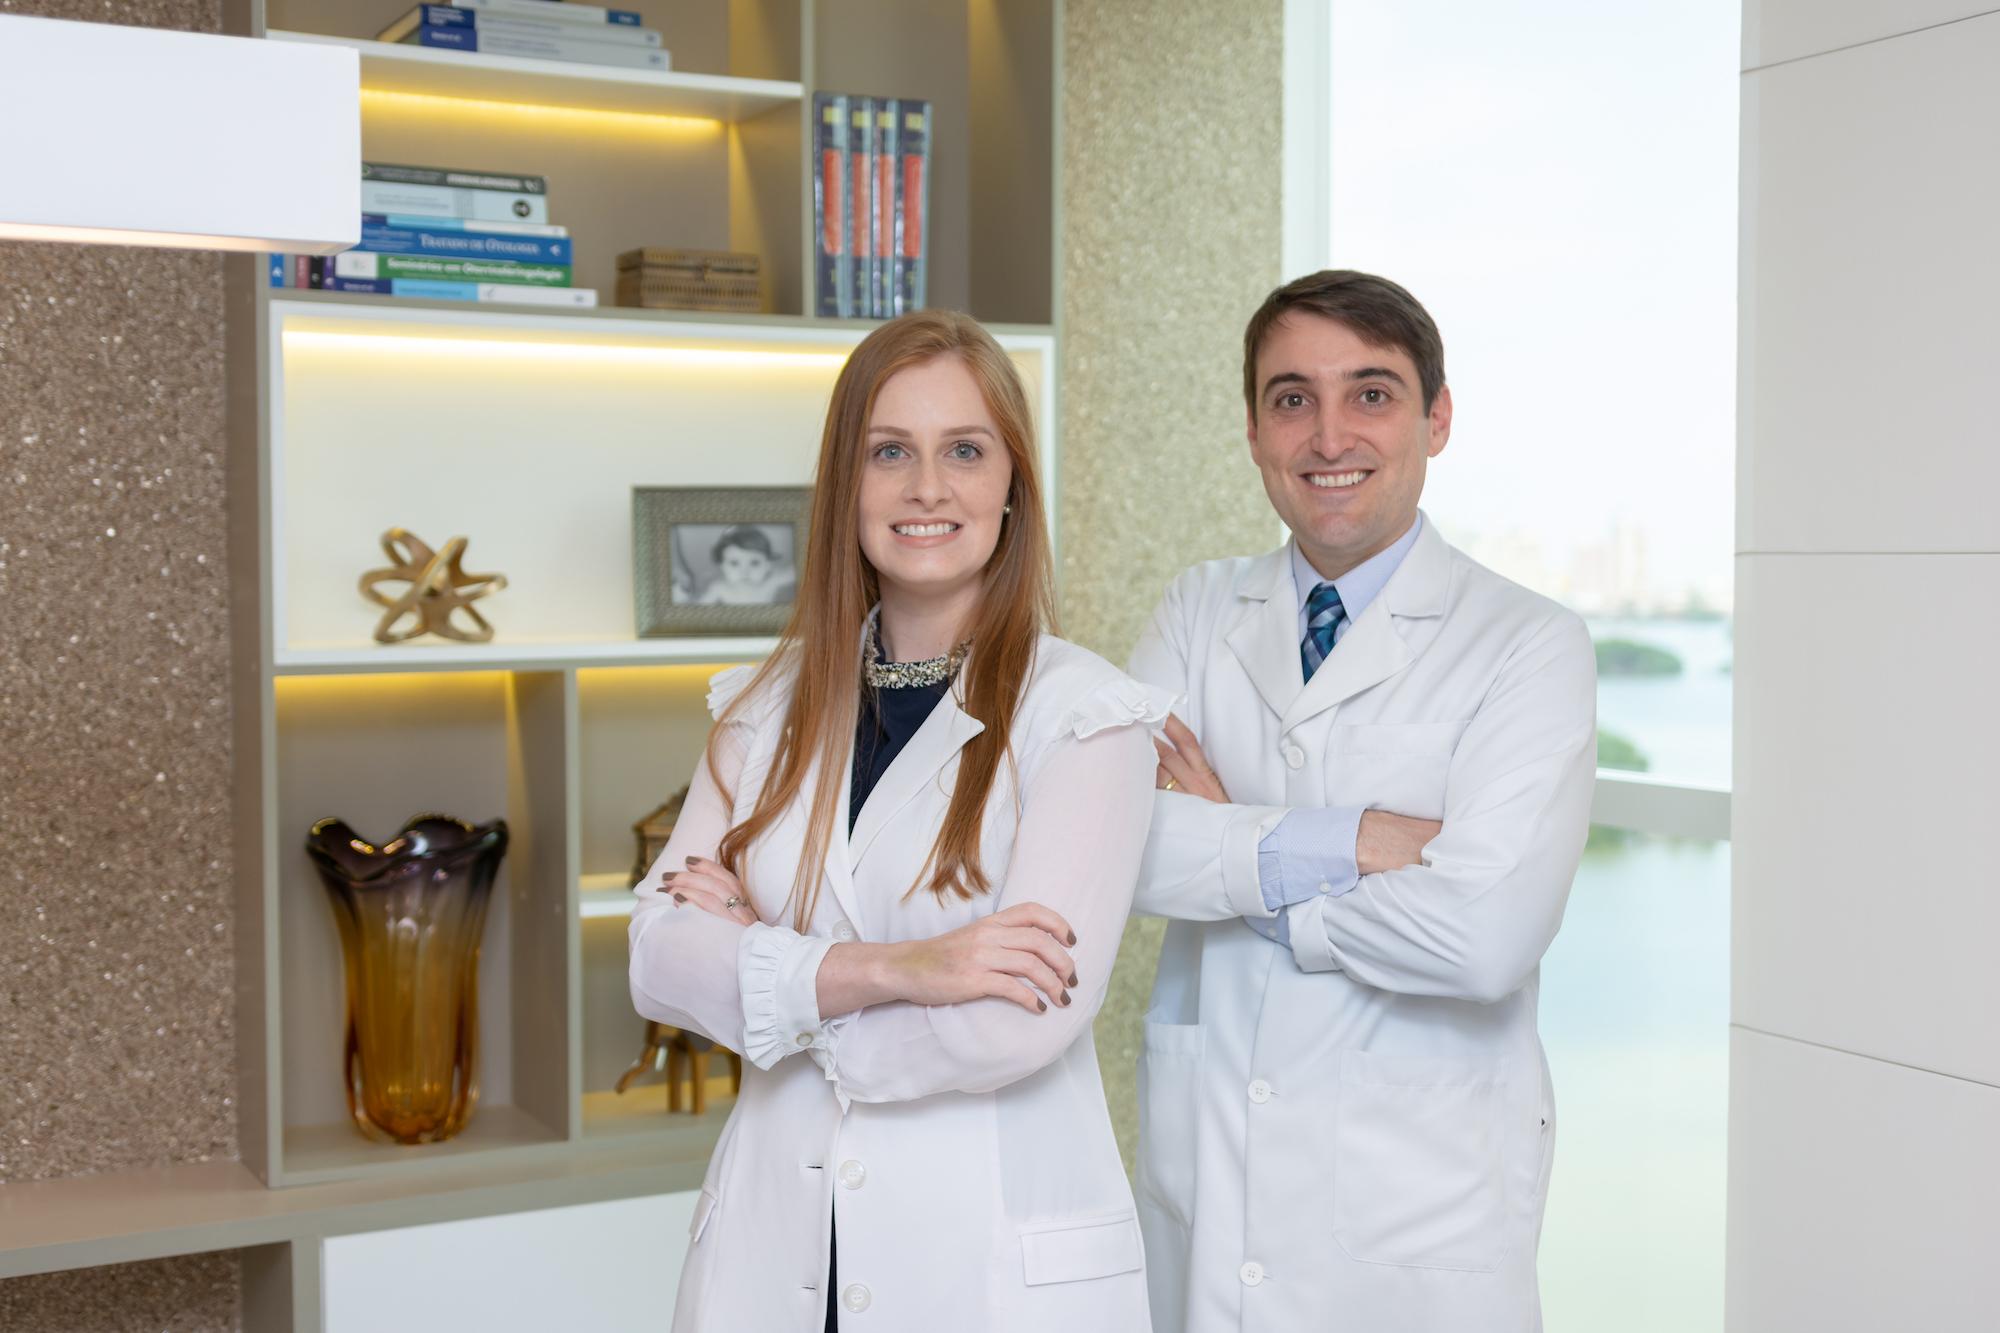 http://clinicarhinus.com.br/wp-content/uploads/2015/12/RHINUS-214.jpg